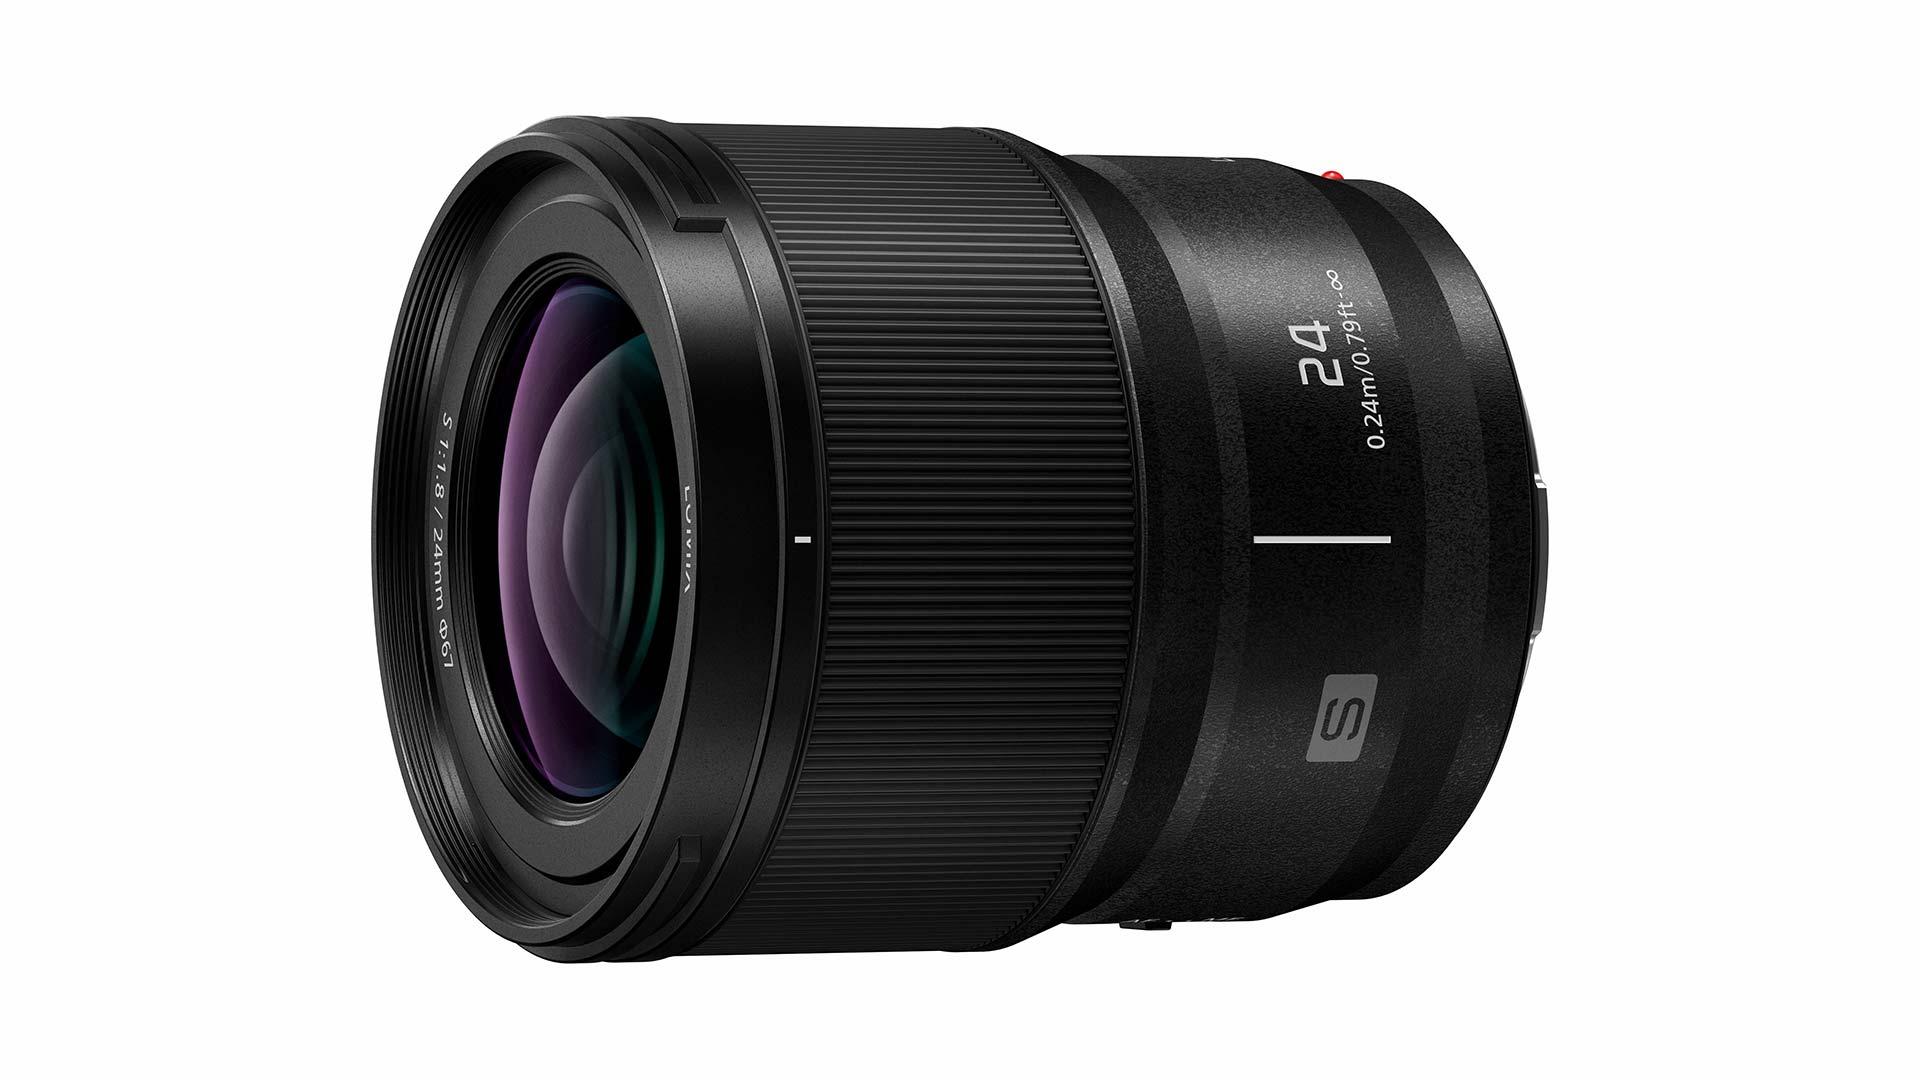 The new Panasonic LUMIX S 24mm f/1.8 lens. Image: Panasonic.